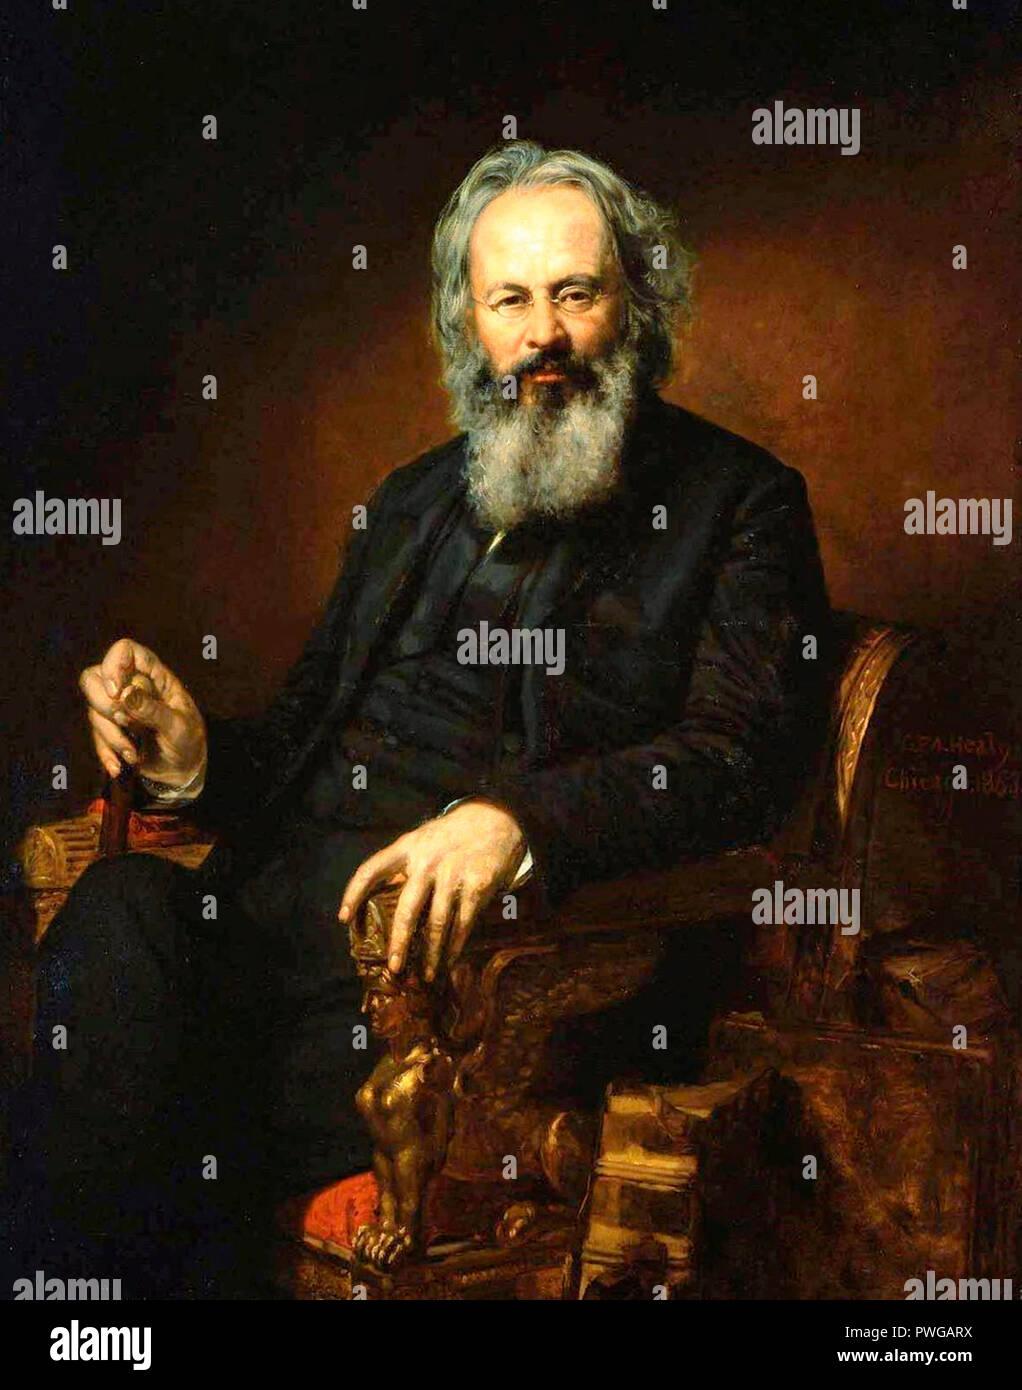 Orestes Brownson - George Peter Alexander Healy, circa 1863 - Stock Image